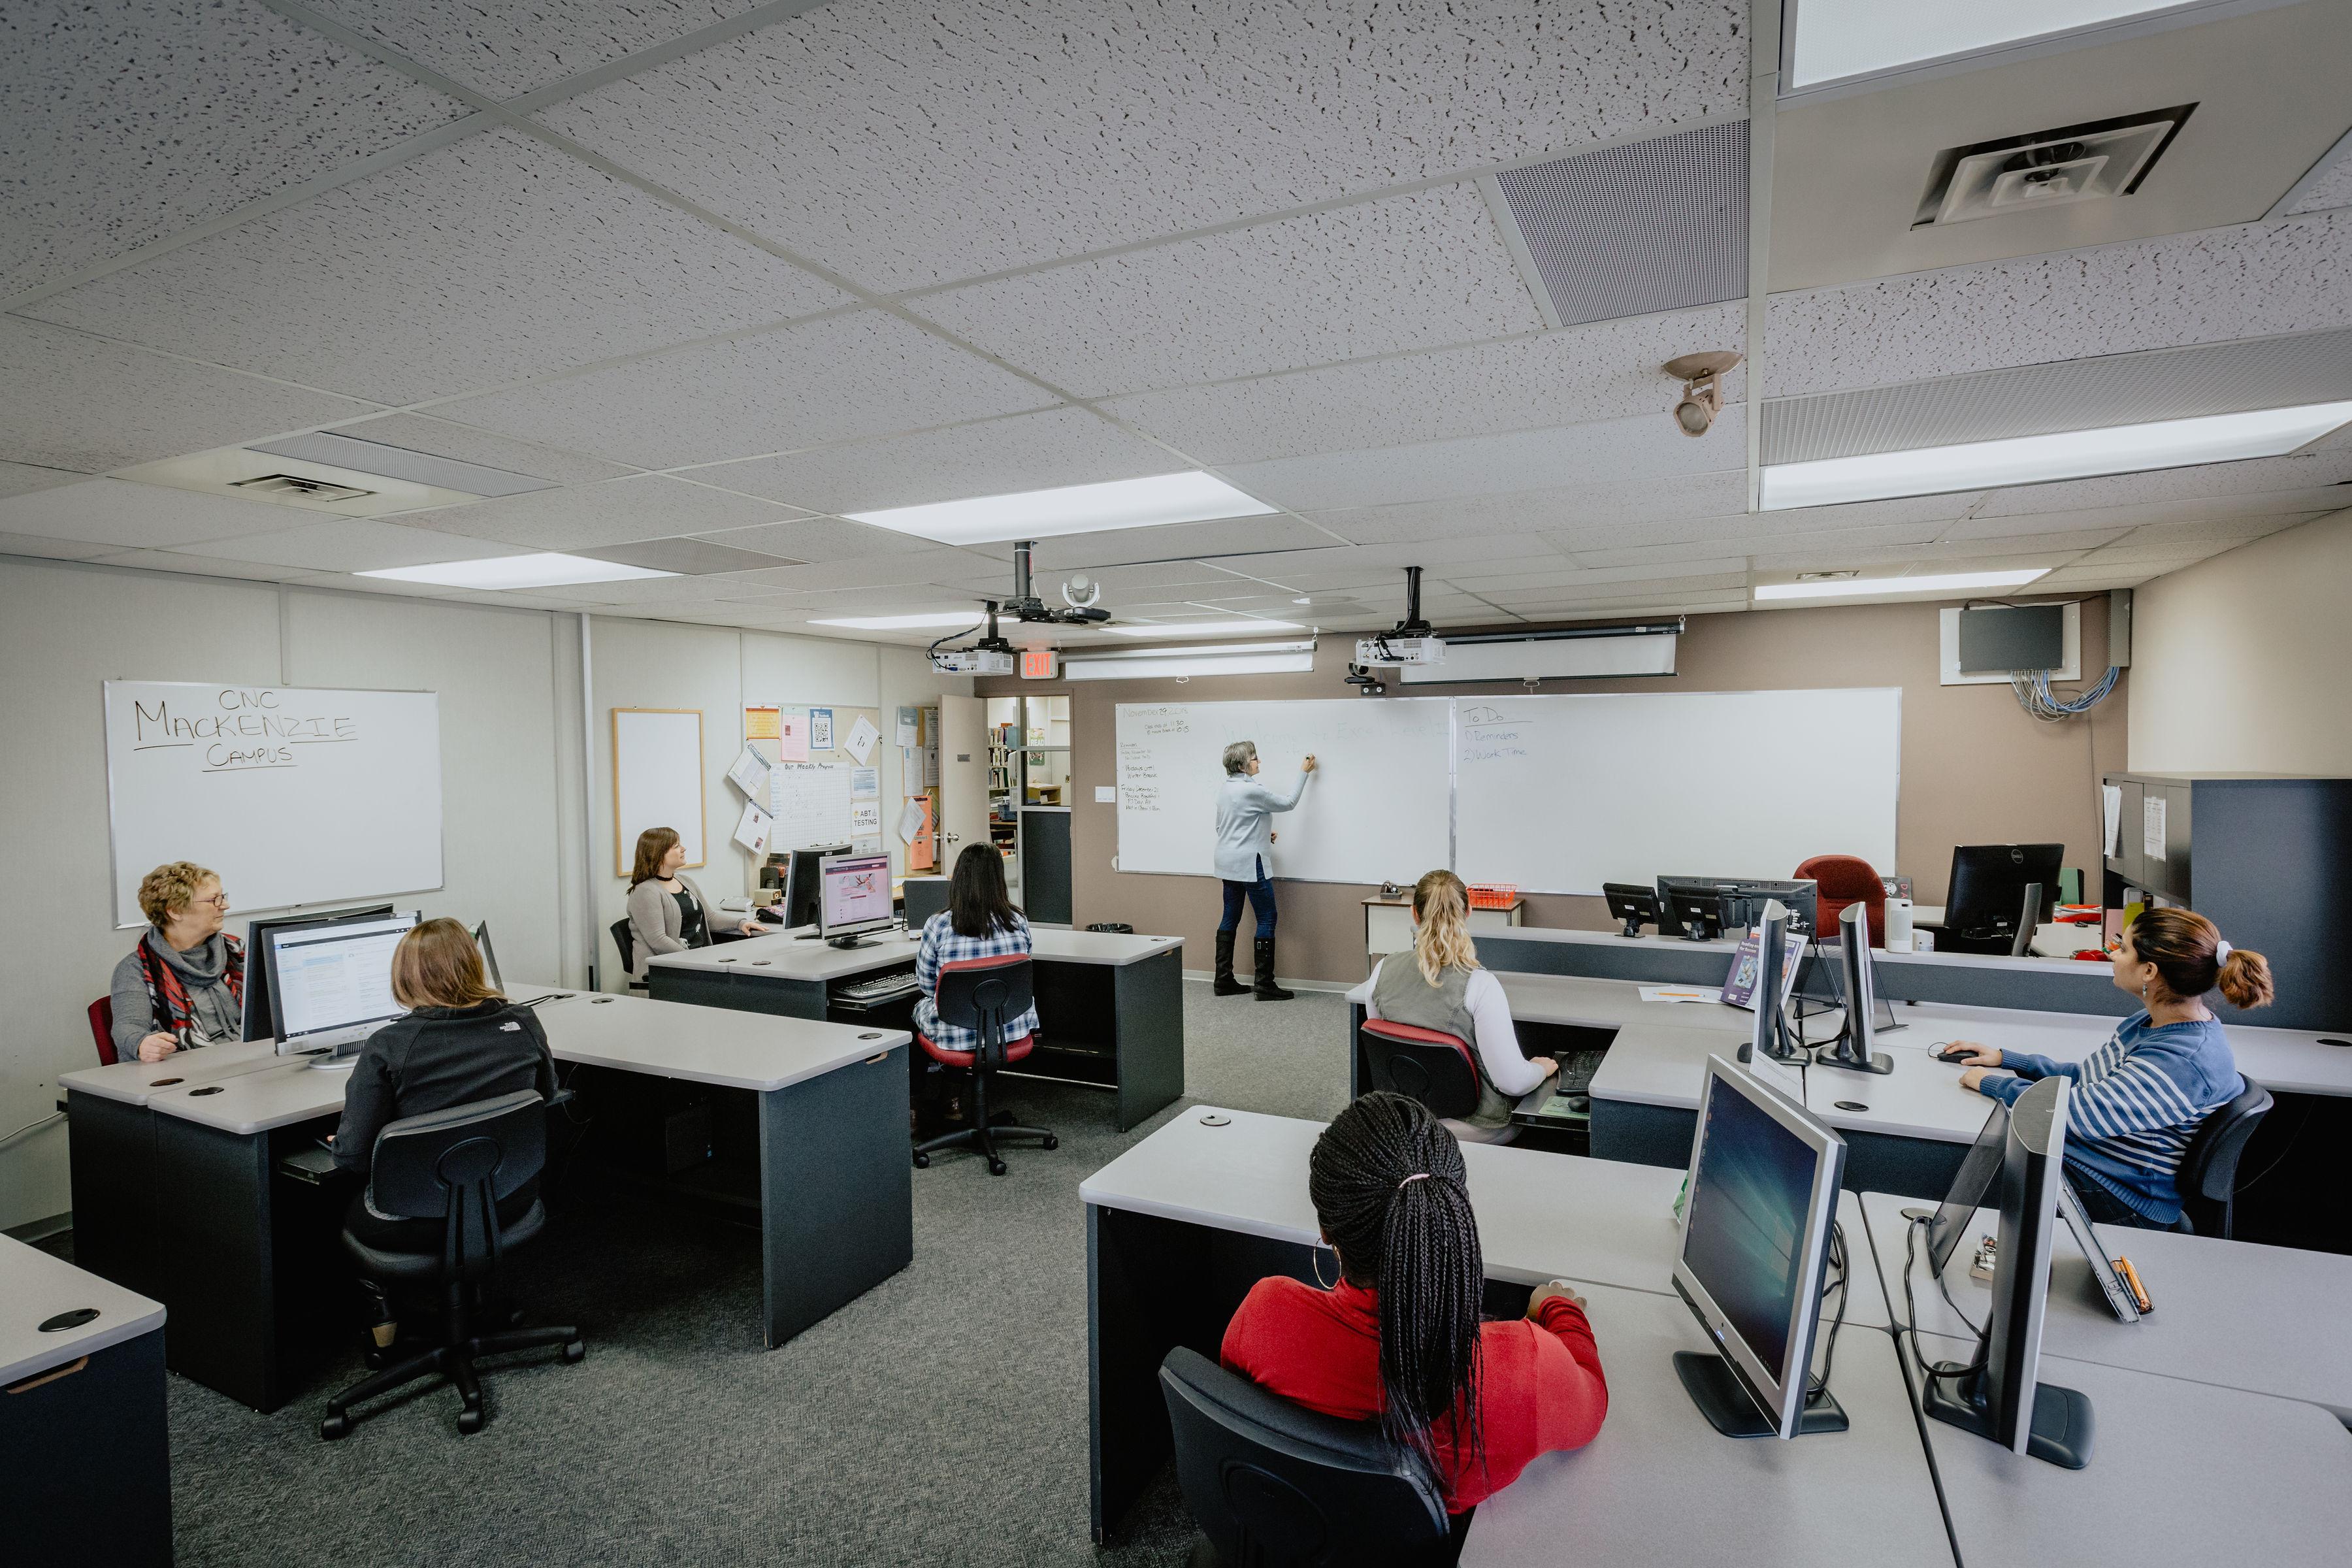 Mackenzie Classroom 2